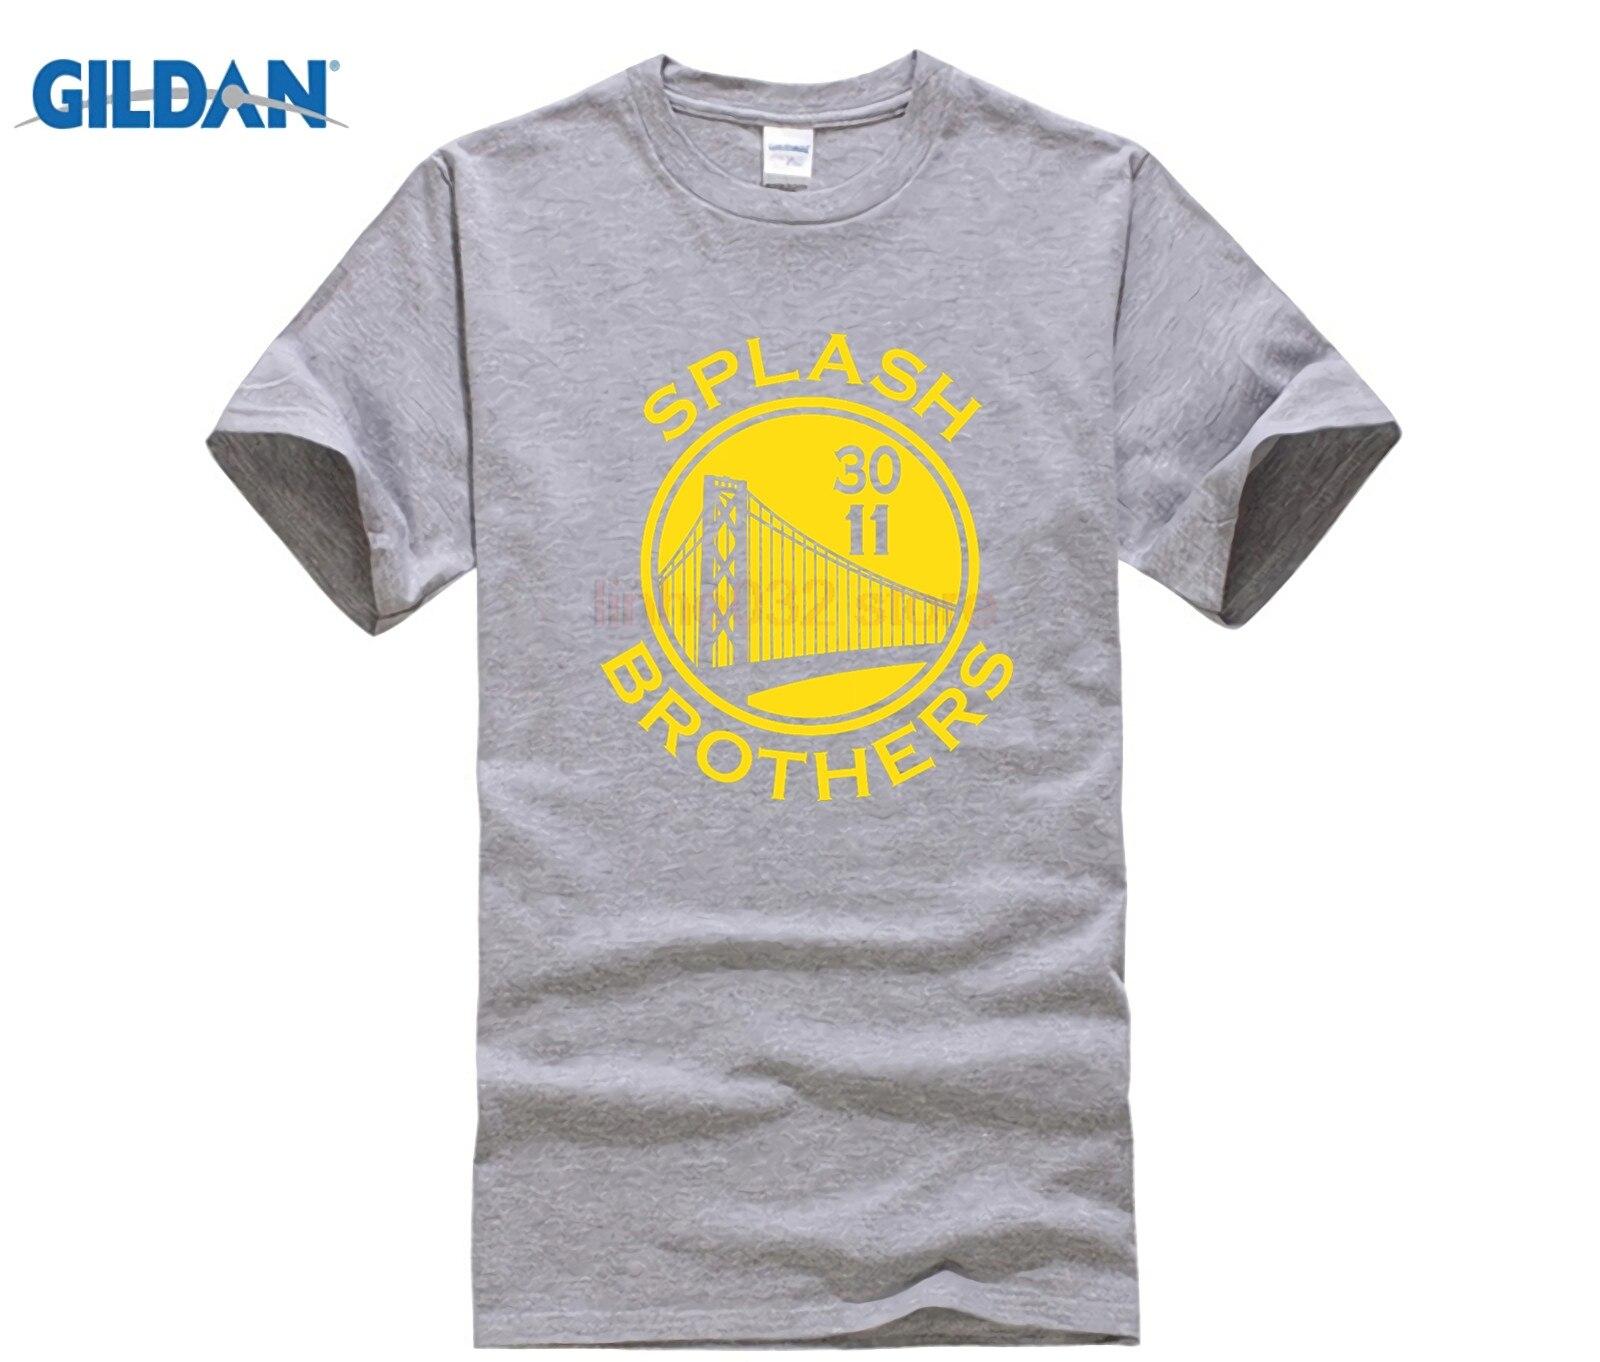 Mvp Thompson 11 Golden City Man Basketballer Playoffs Short Sleeves Cotton Free Shipping T Shirt Hoodie Hip Hop T-shirt Jacket Men's Clothing